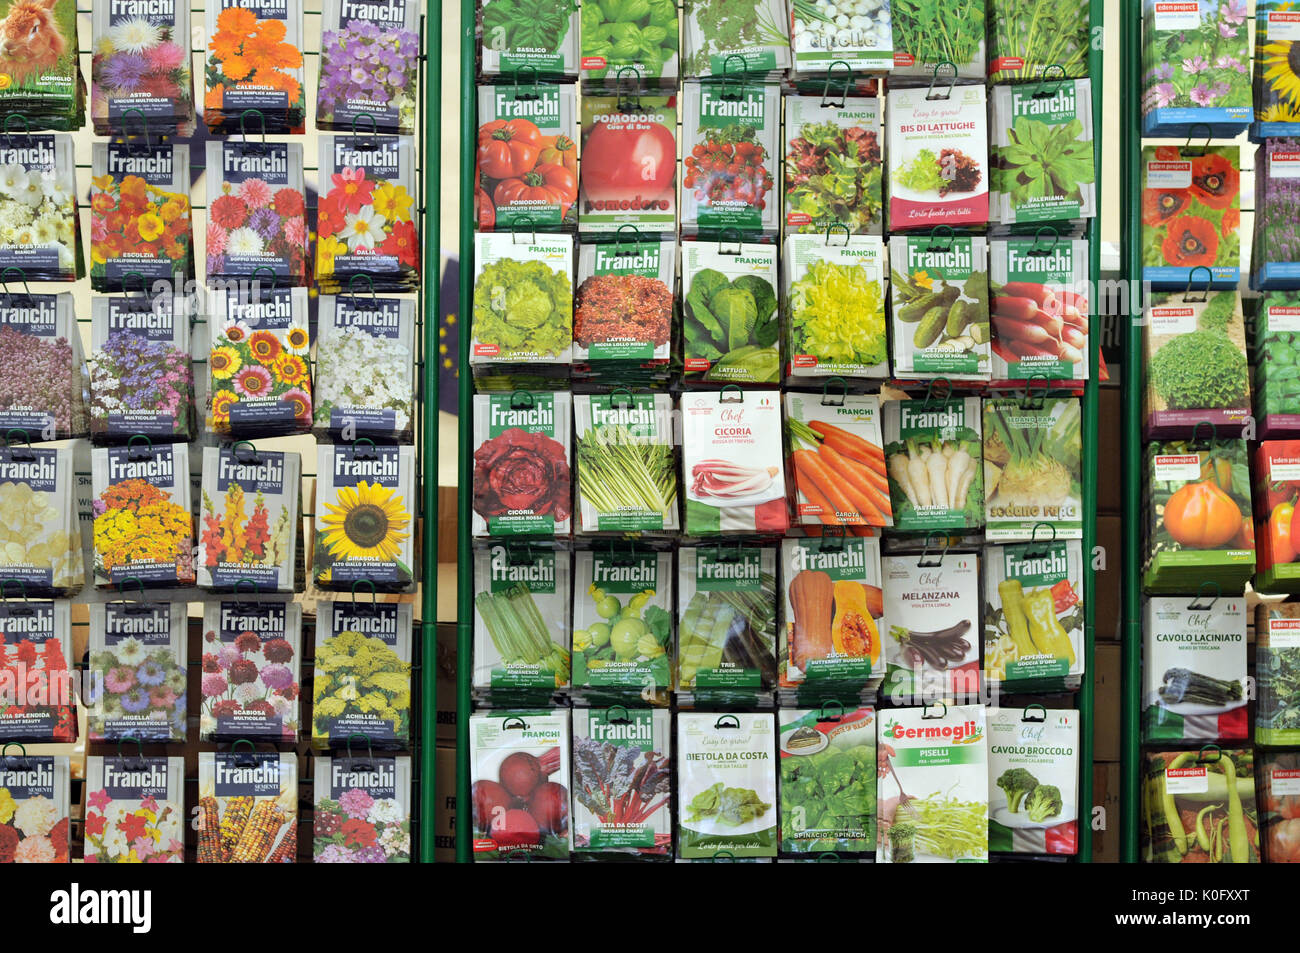 White Garden Stones Asda: Gardening Supplies Stock Photos & Gardening Supplies Stock